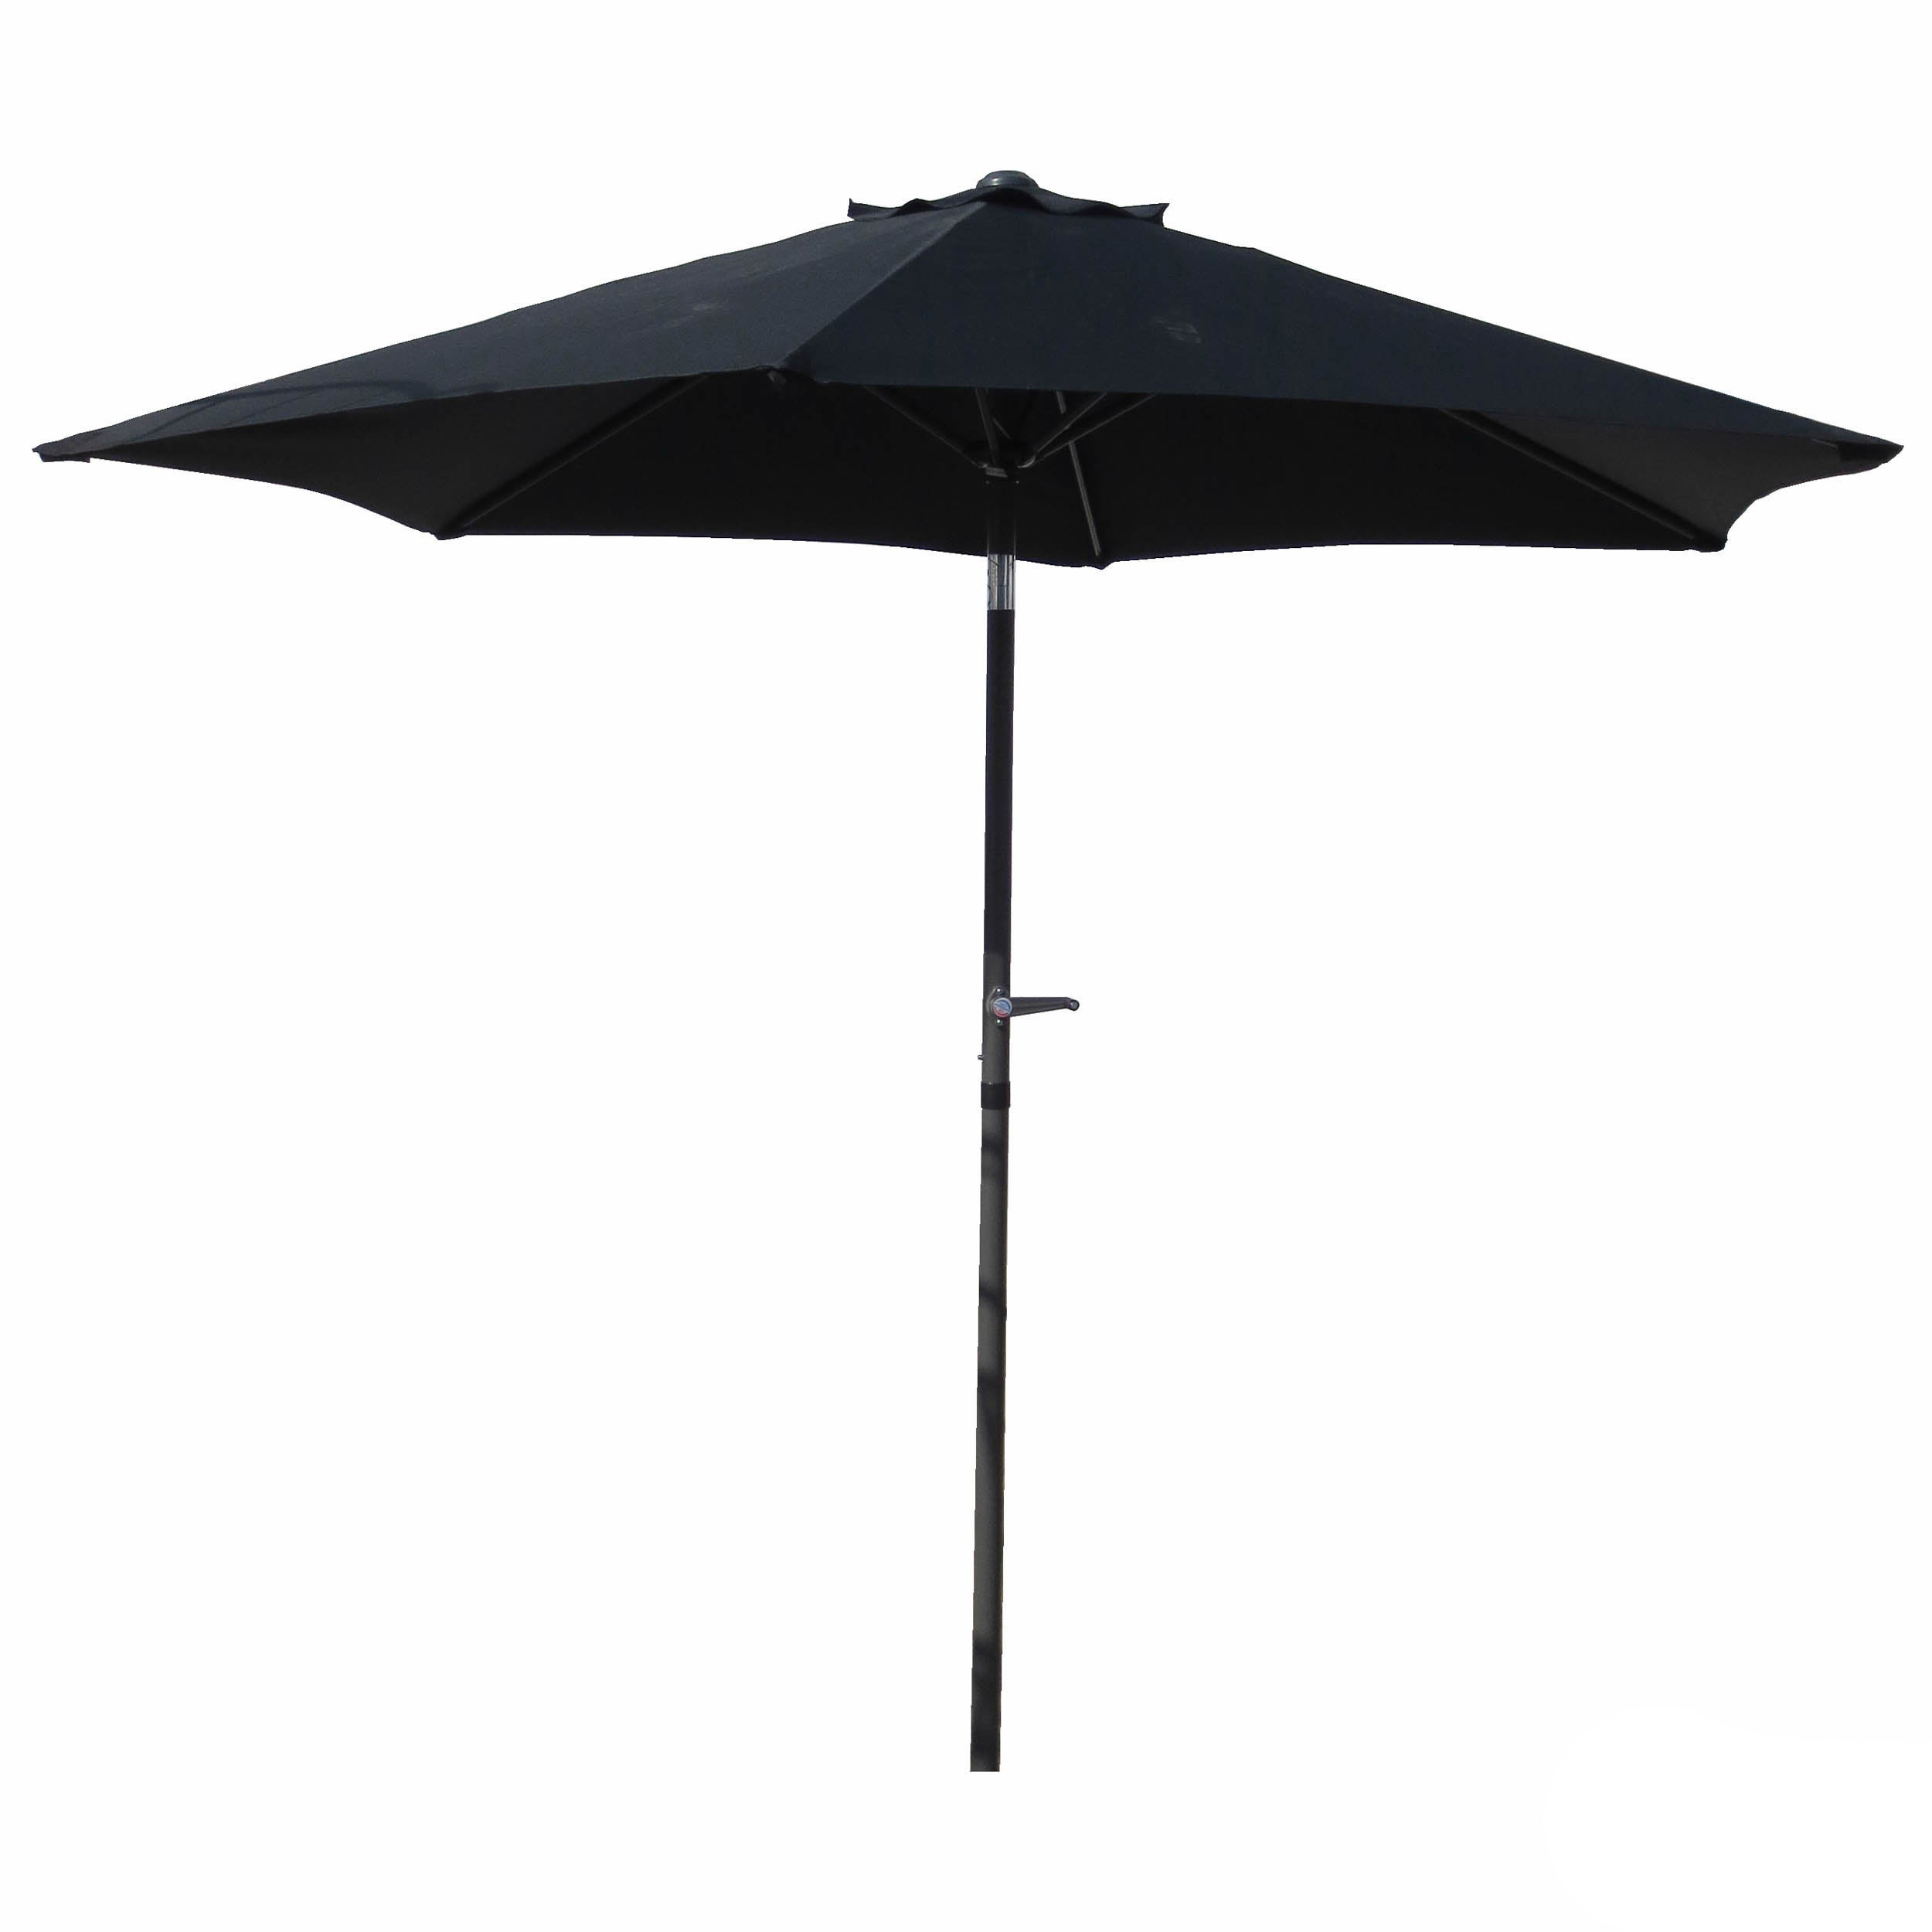 Exceptional Patio Umbrella 8 Foot (Option: Black Canopy)